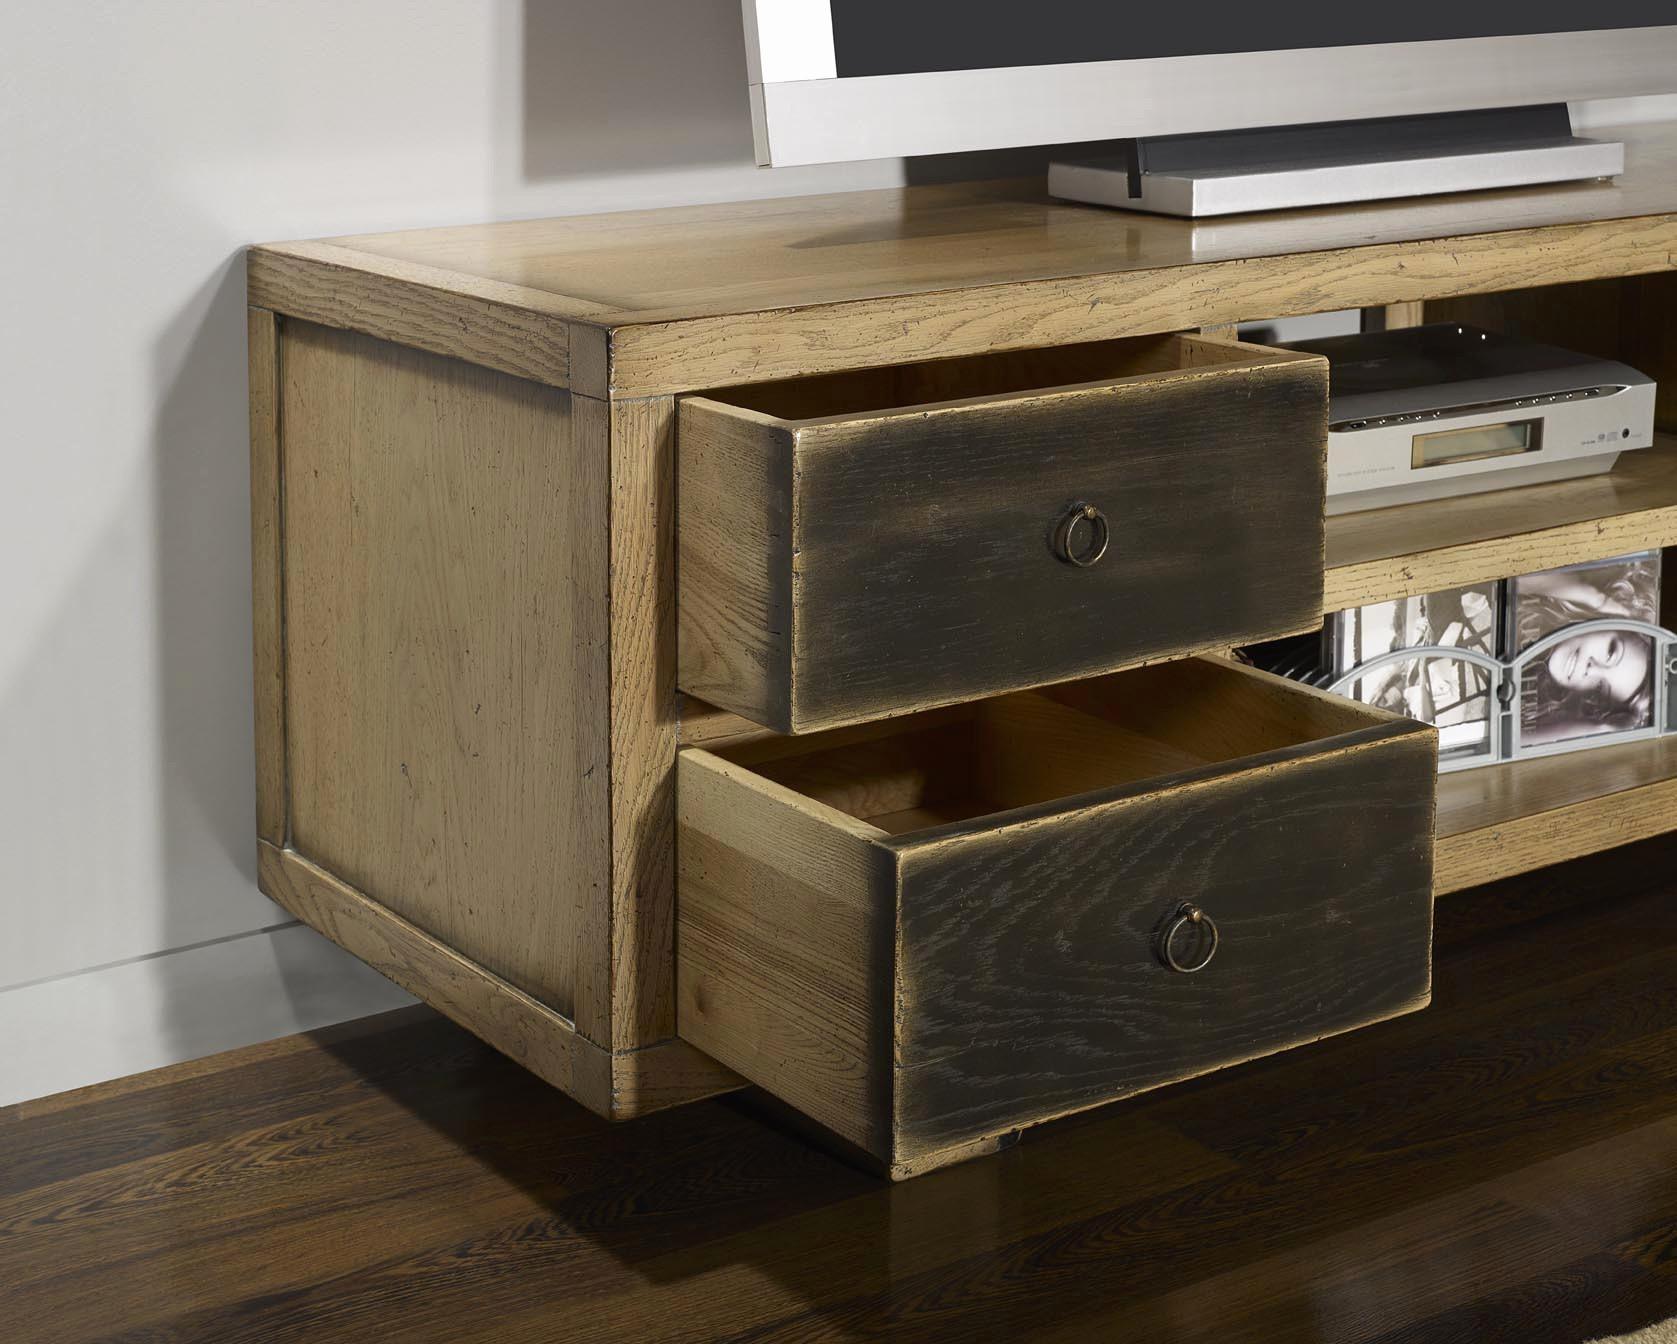 fabricant meuble bois massif charmant meuble tv en bois massif raviraj of fabricant meuble bois massif